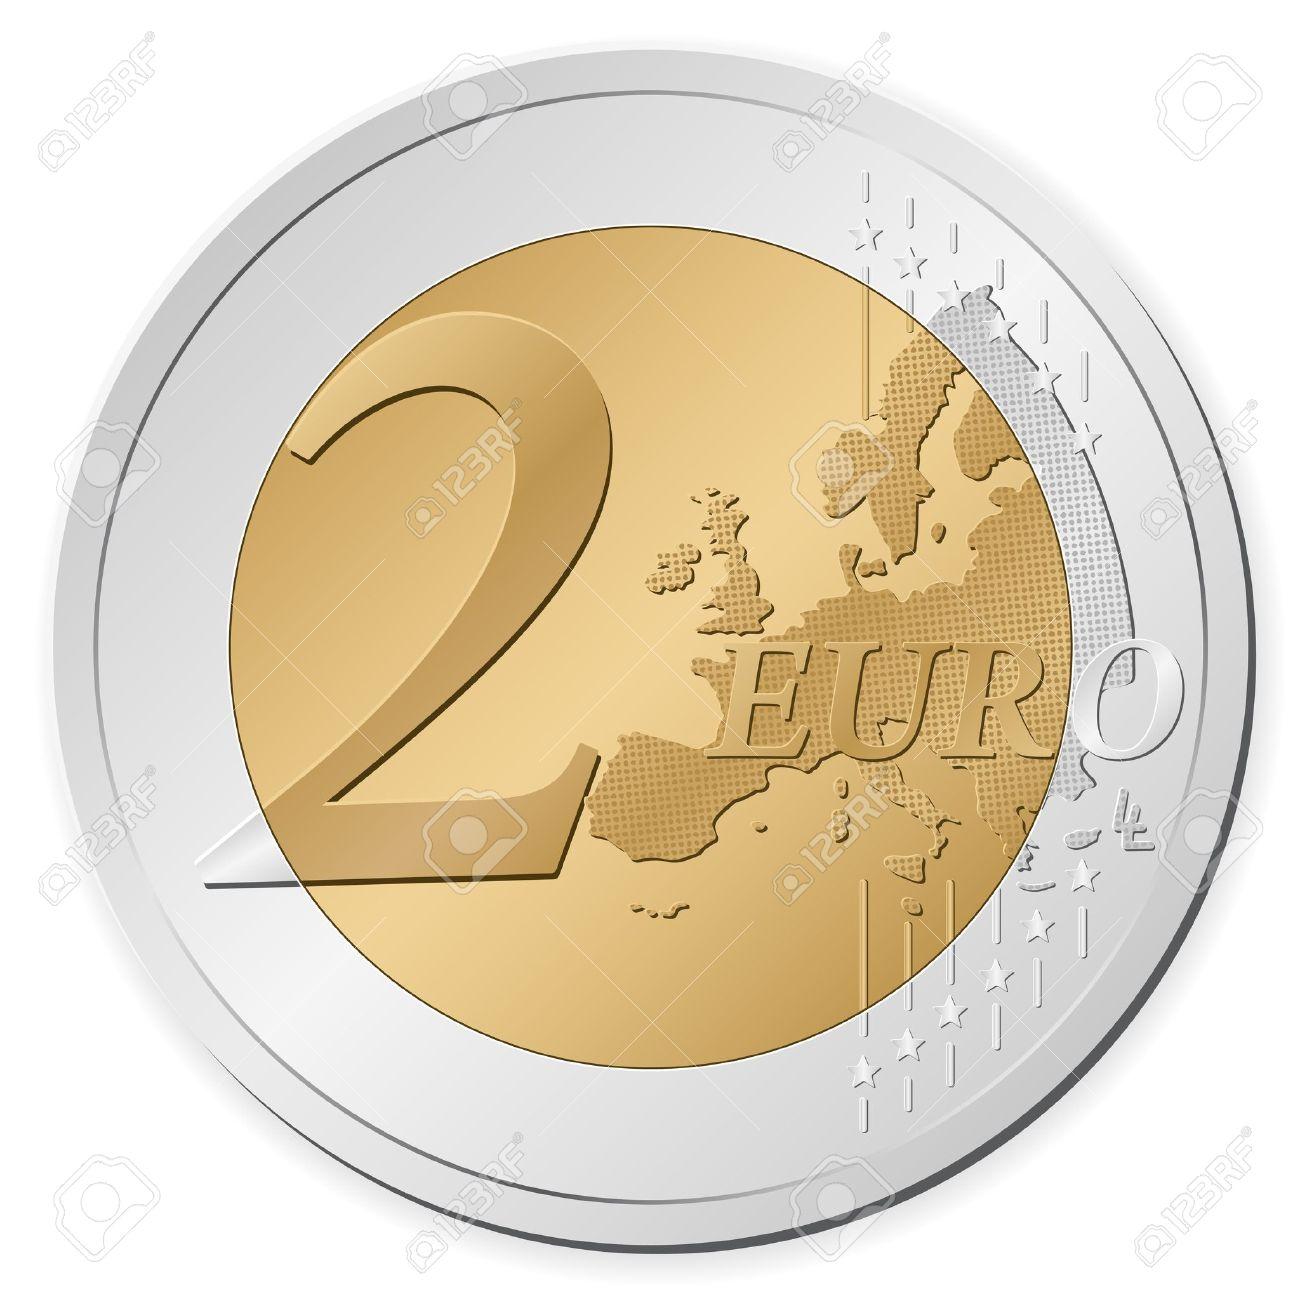 2 euros clipart.